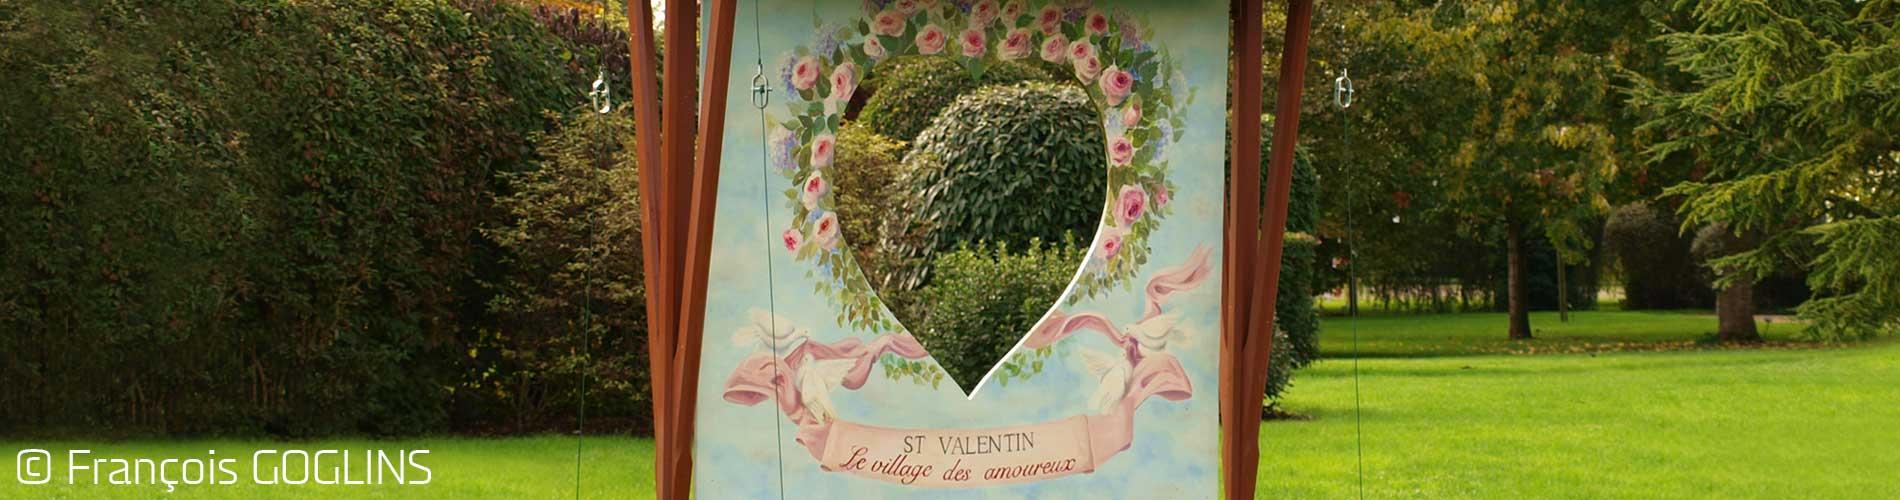 Blog_ValentinesDay_France_SaintValentin_1900x500_Q120